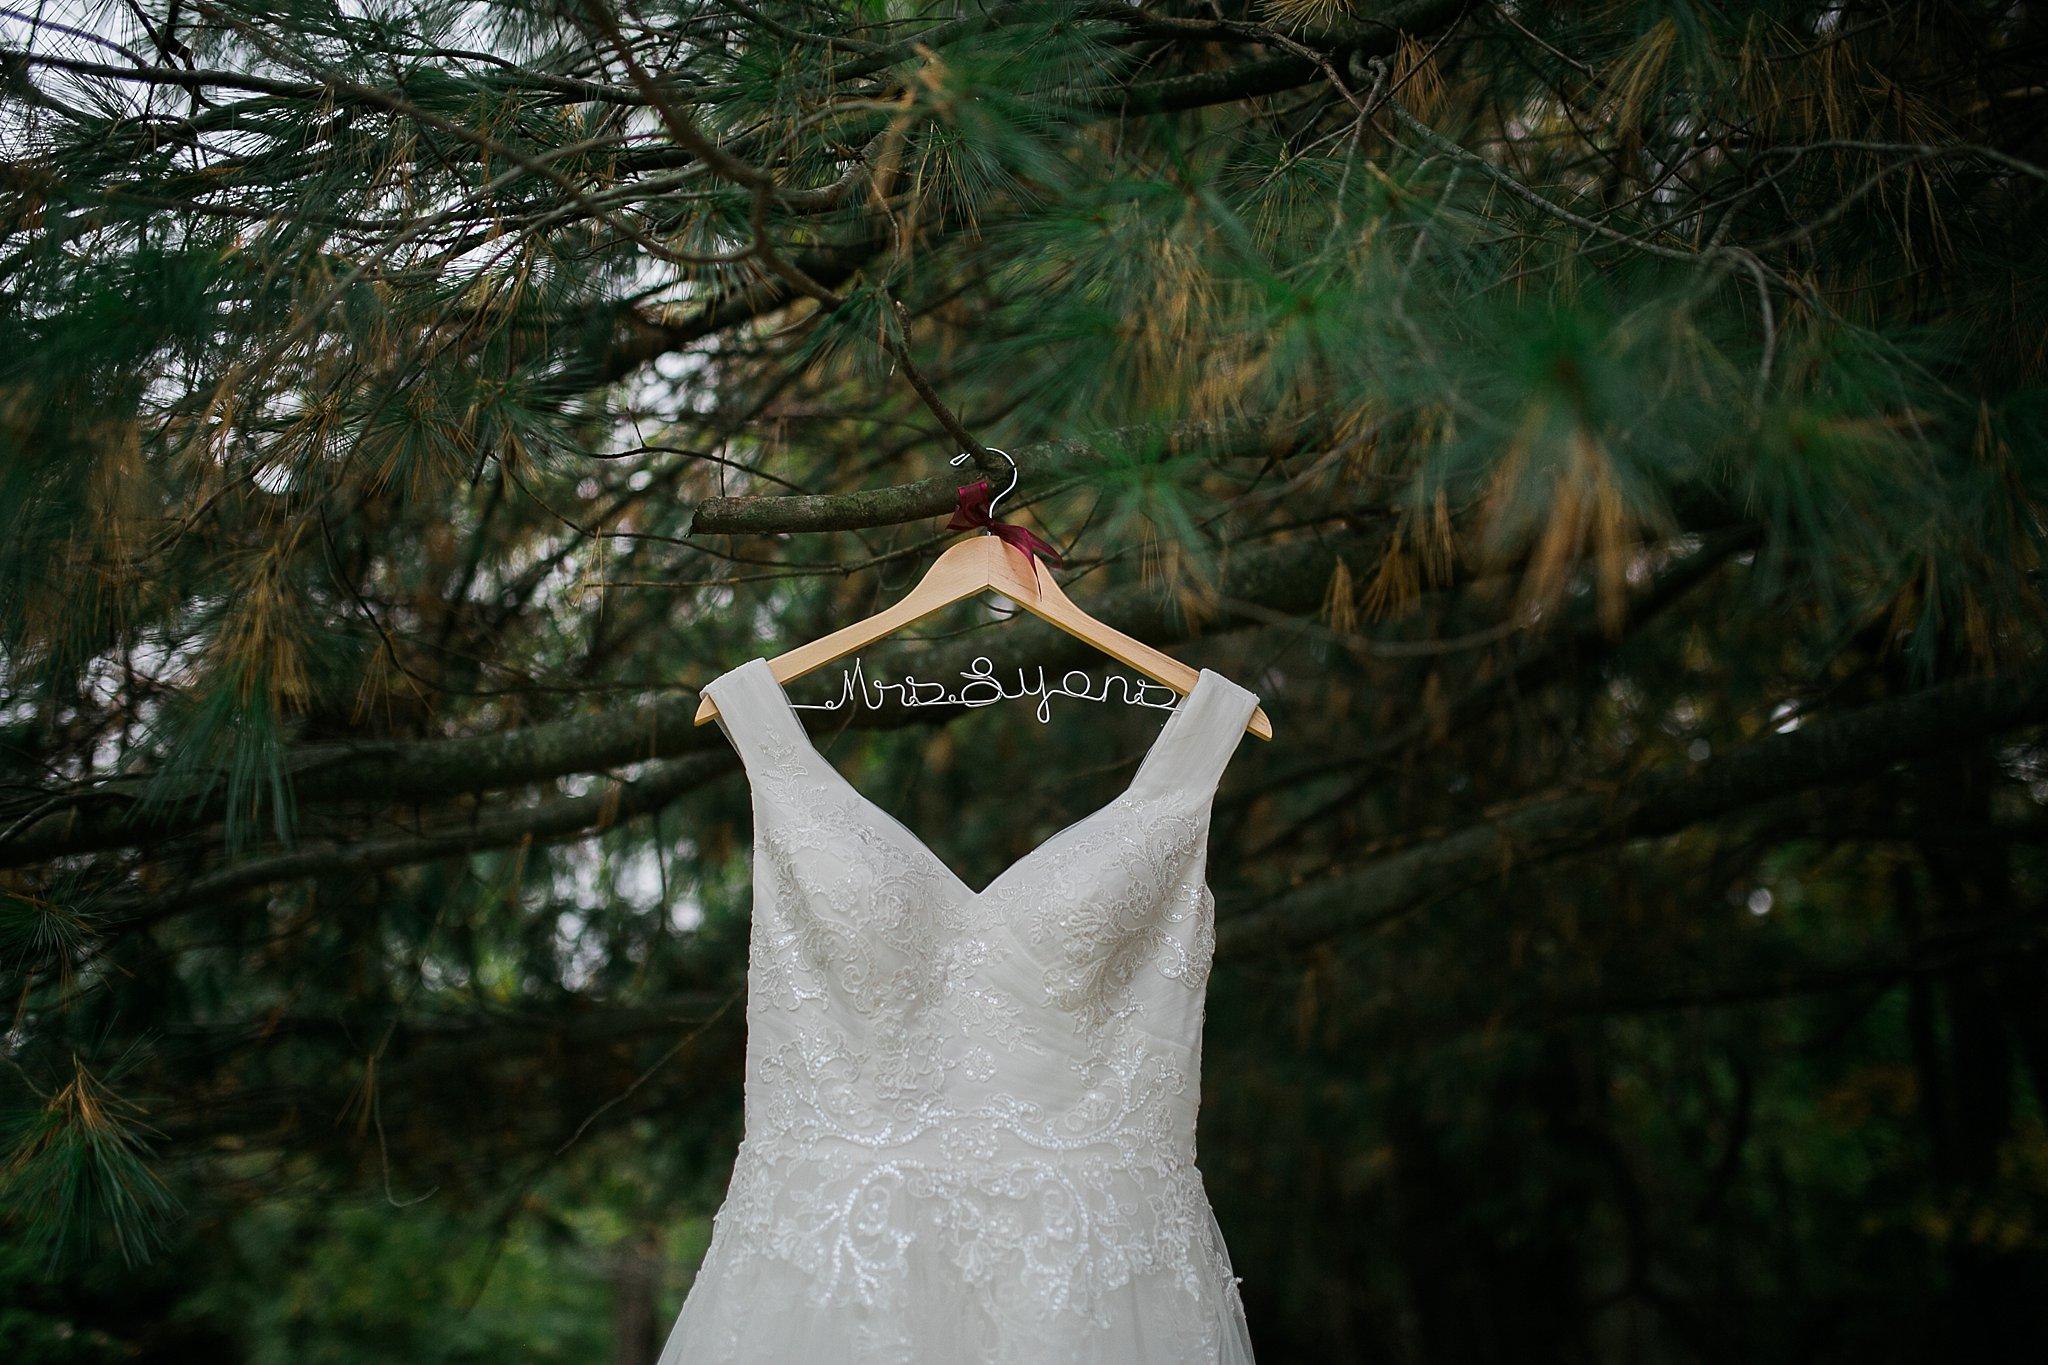 New Windsor New York Hudson Valley New York Wedding Photographer 2.jpg